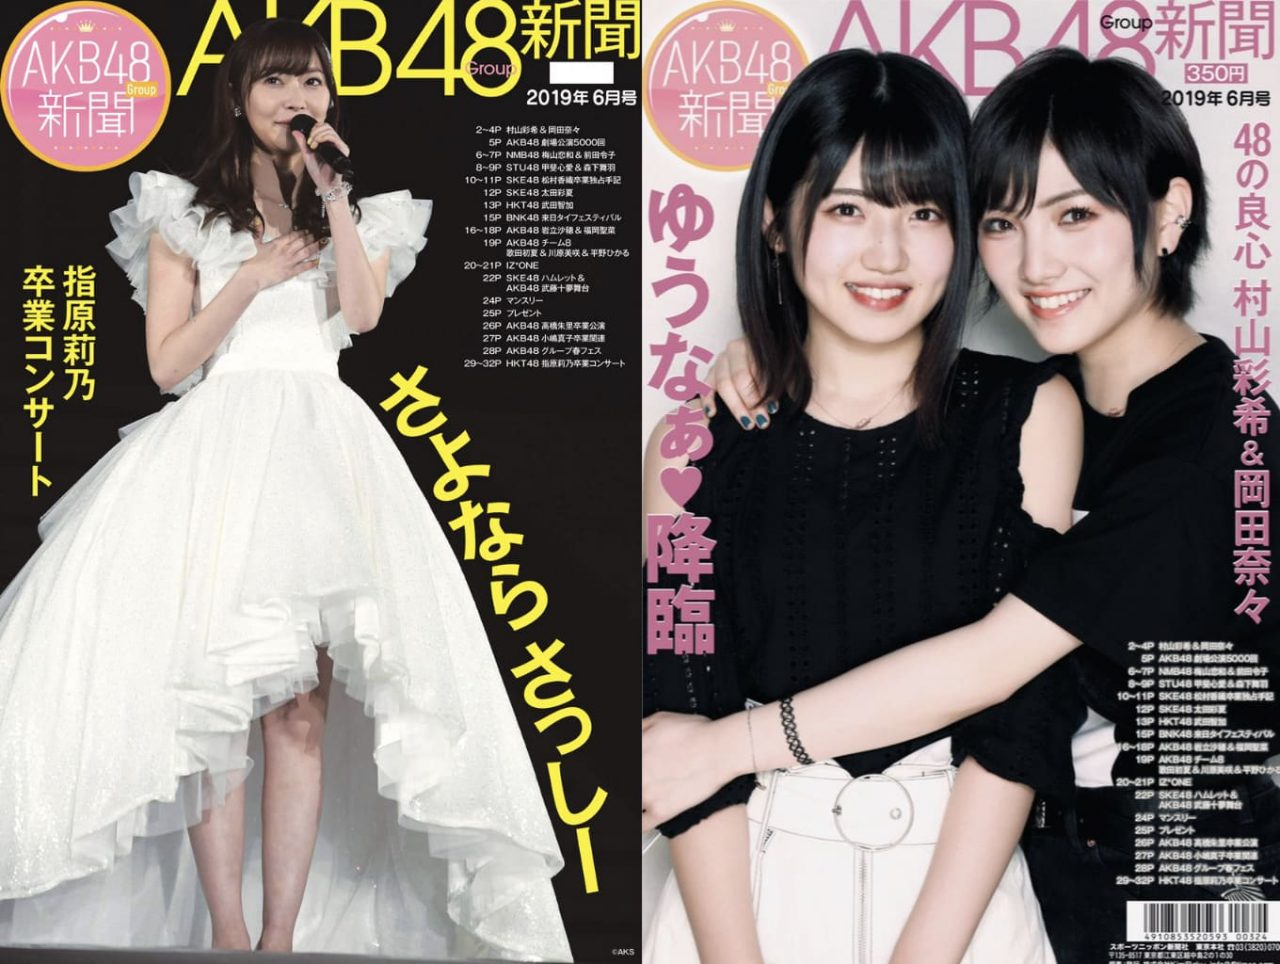 AKB48 村山彩希×岡田奈々、指原莉乃 W表紙! 「AKB48Group新聞 2019年6月号」 [5/24発売]